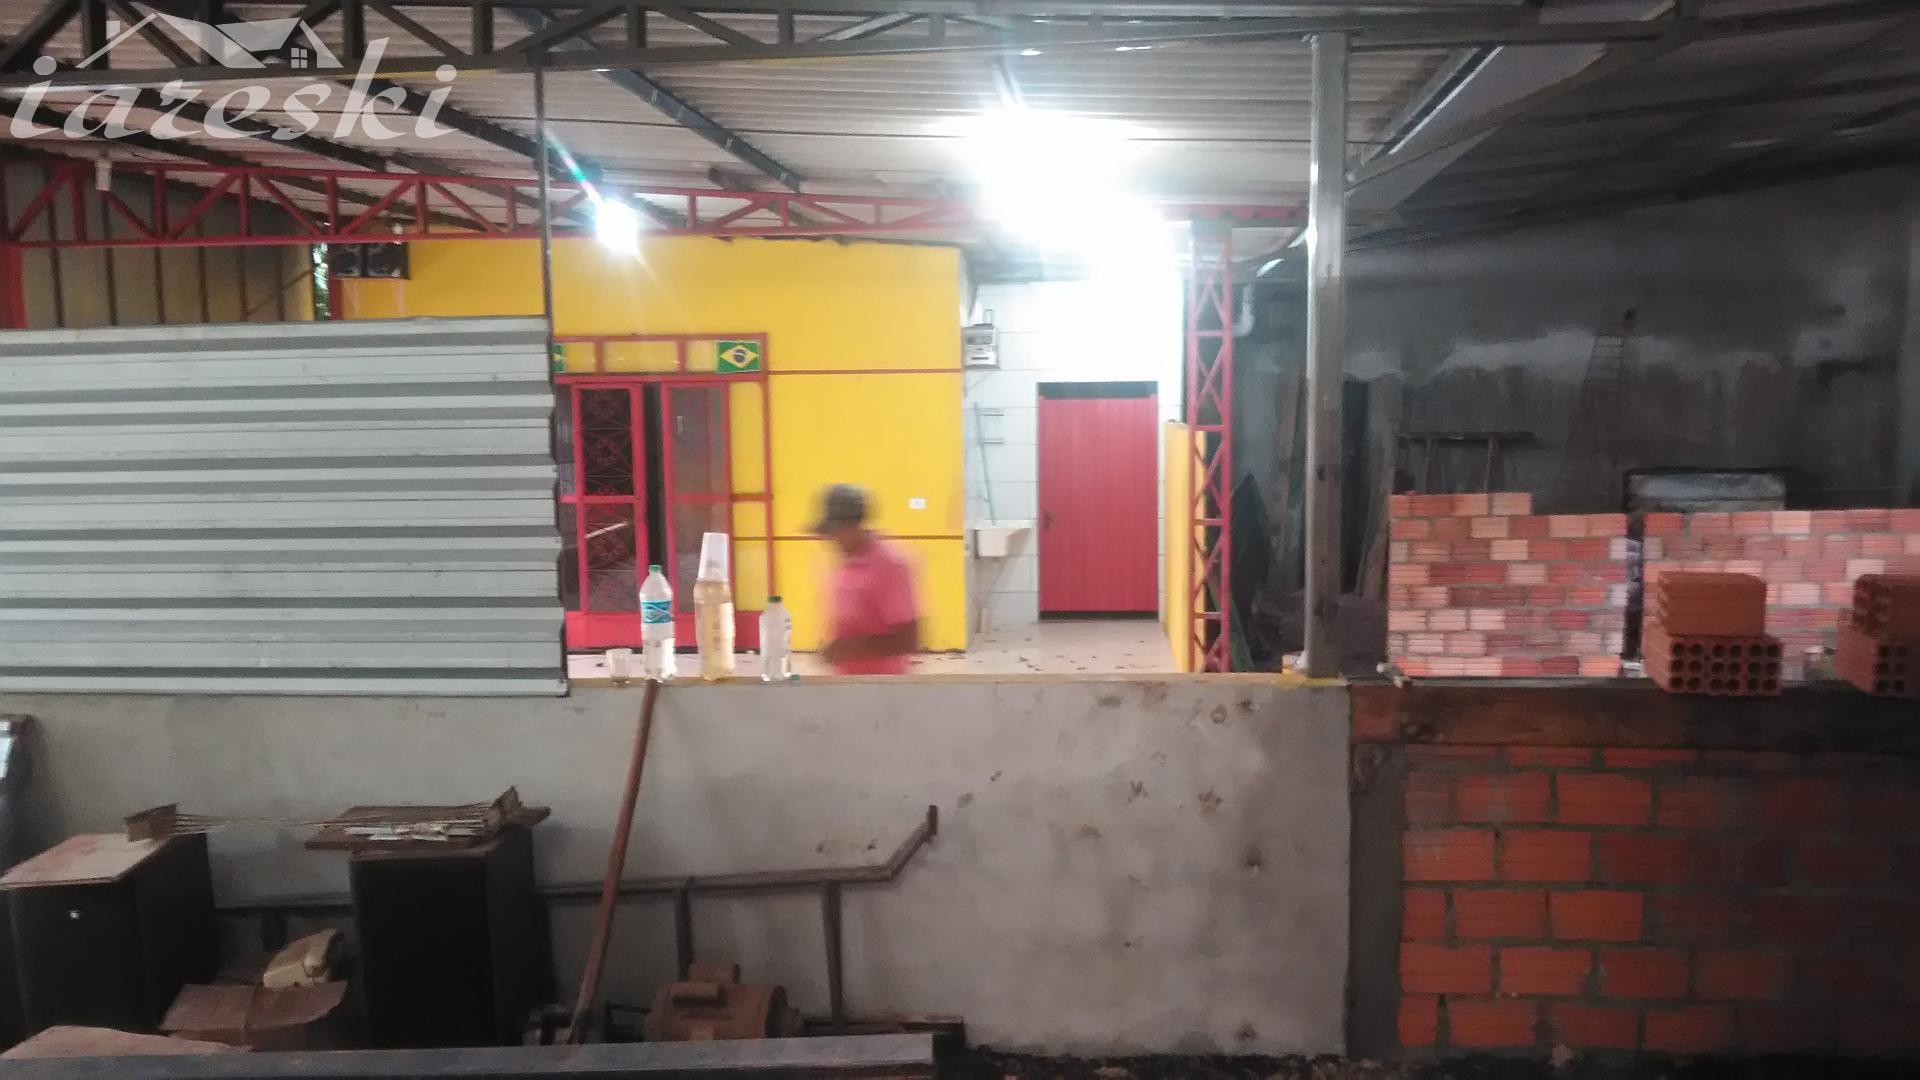 Iareski Imóveis em Foz do Iguaçu/PR